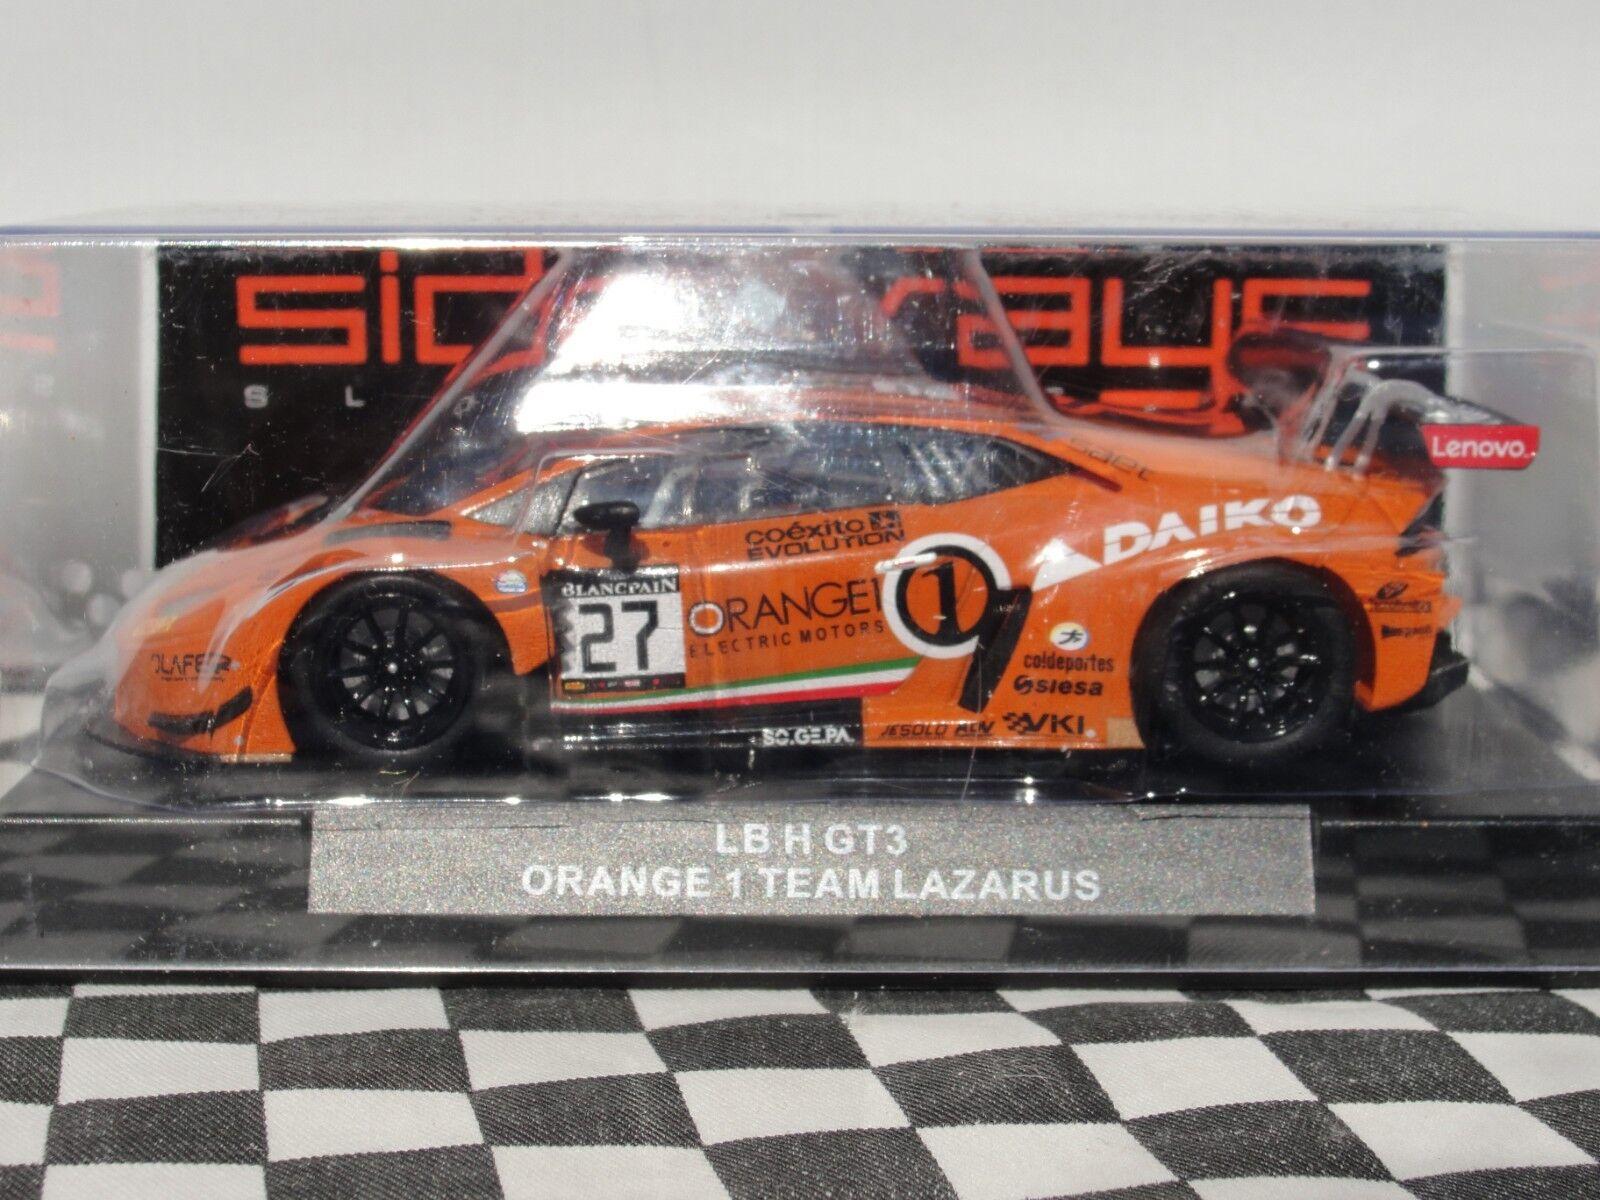 SIDEWAYS RACER LAMBORGHINI  HURACAN orange 1 TEAM LAZARUS'  SWCAR01D 1 32 BNIB